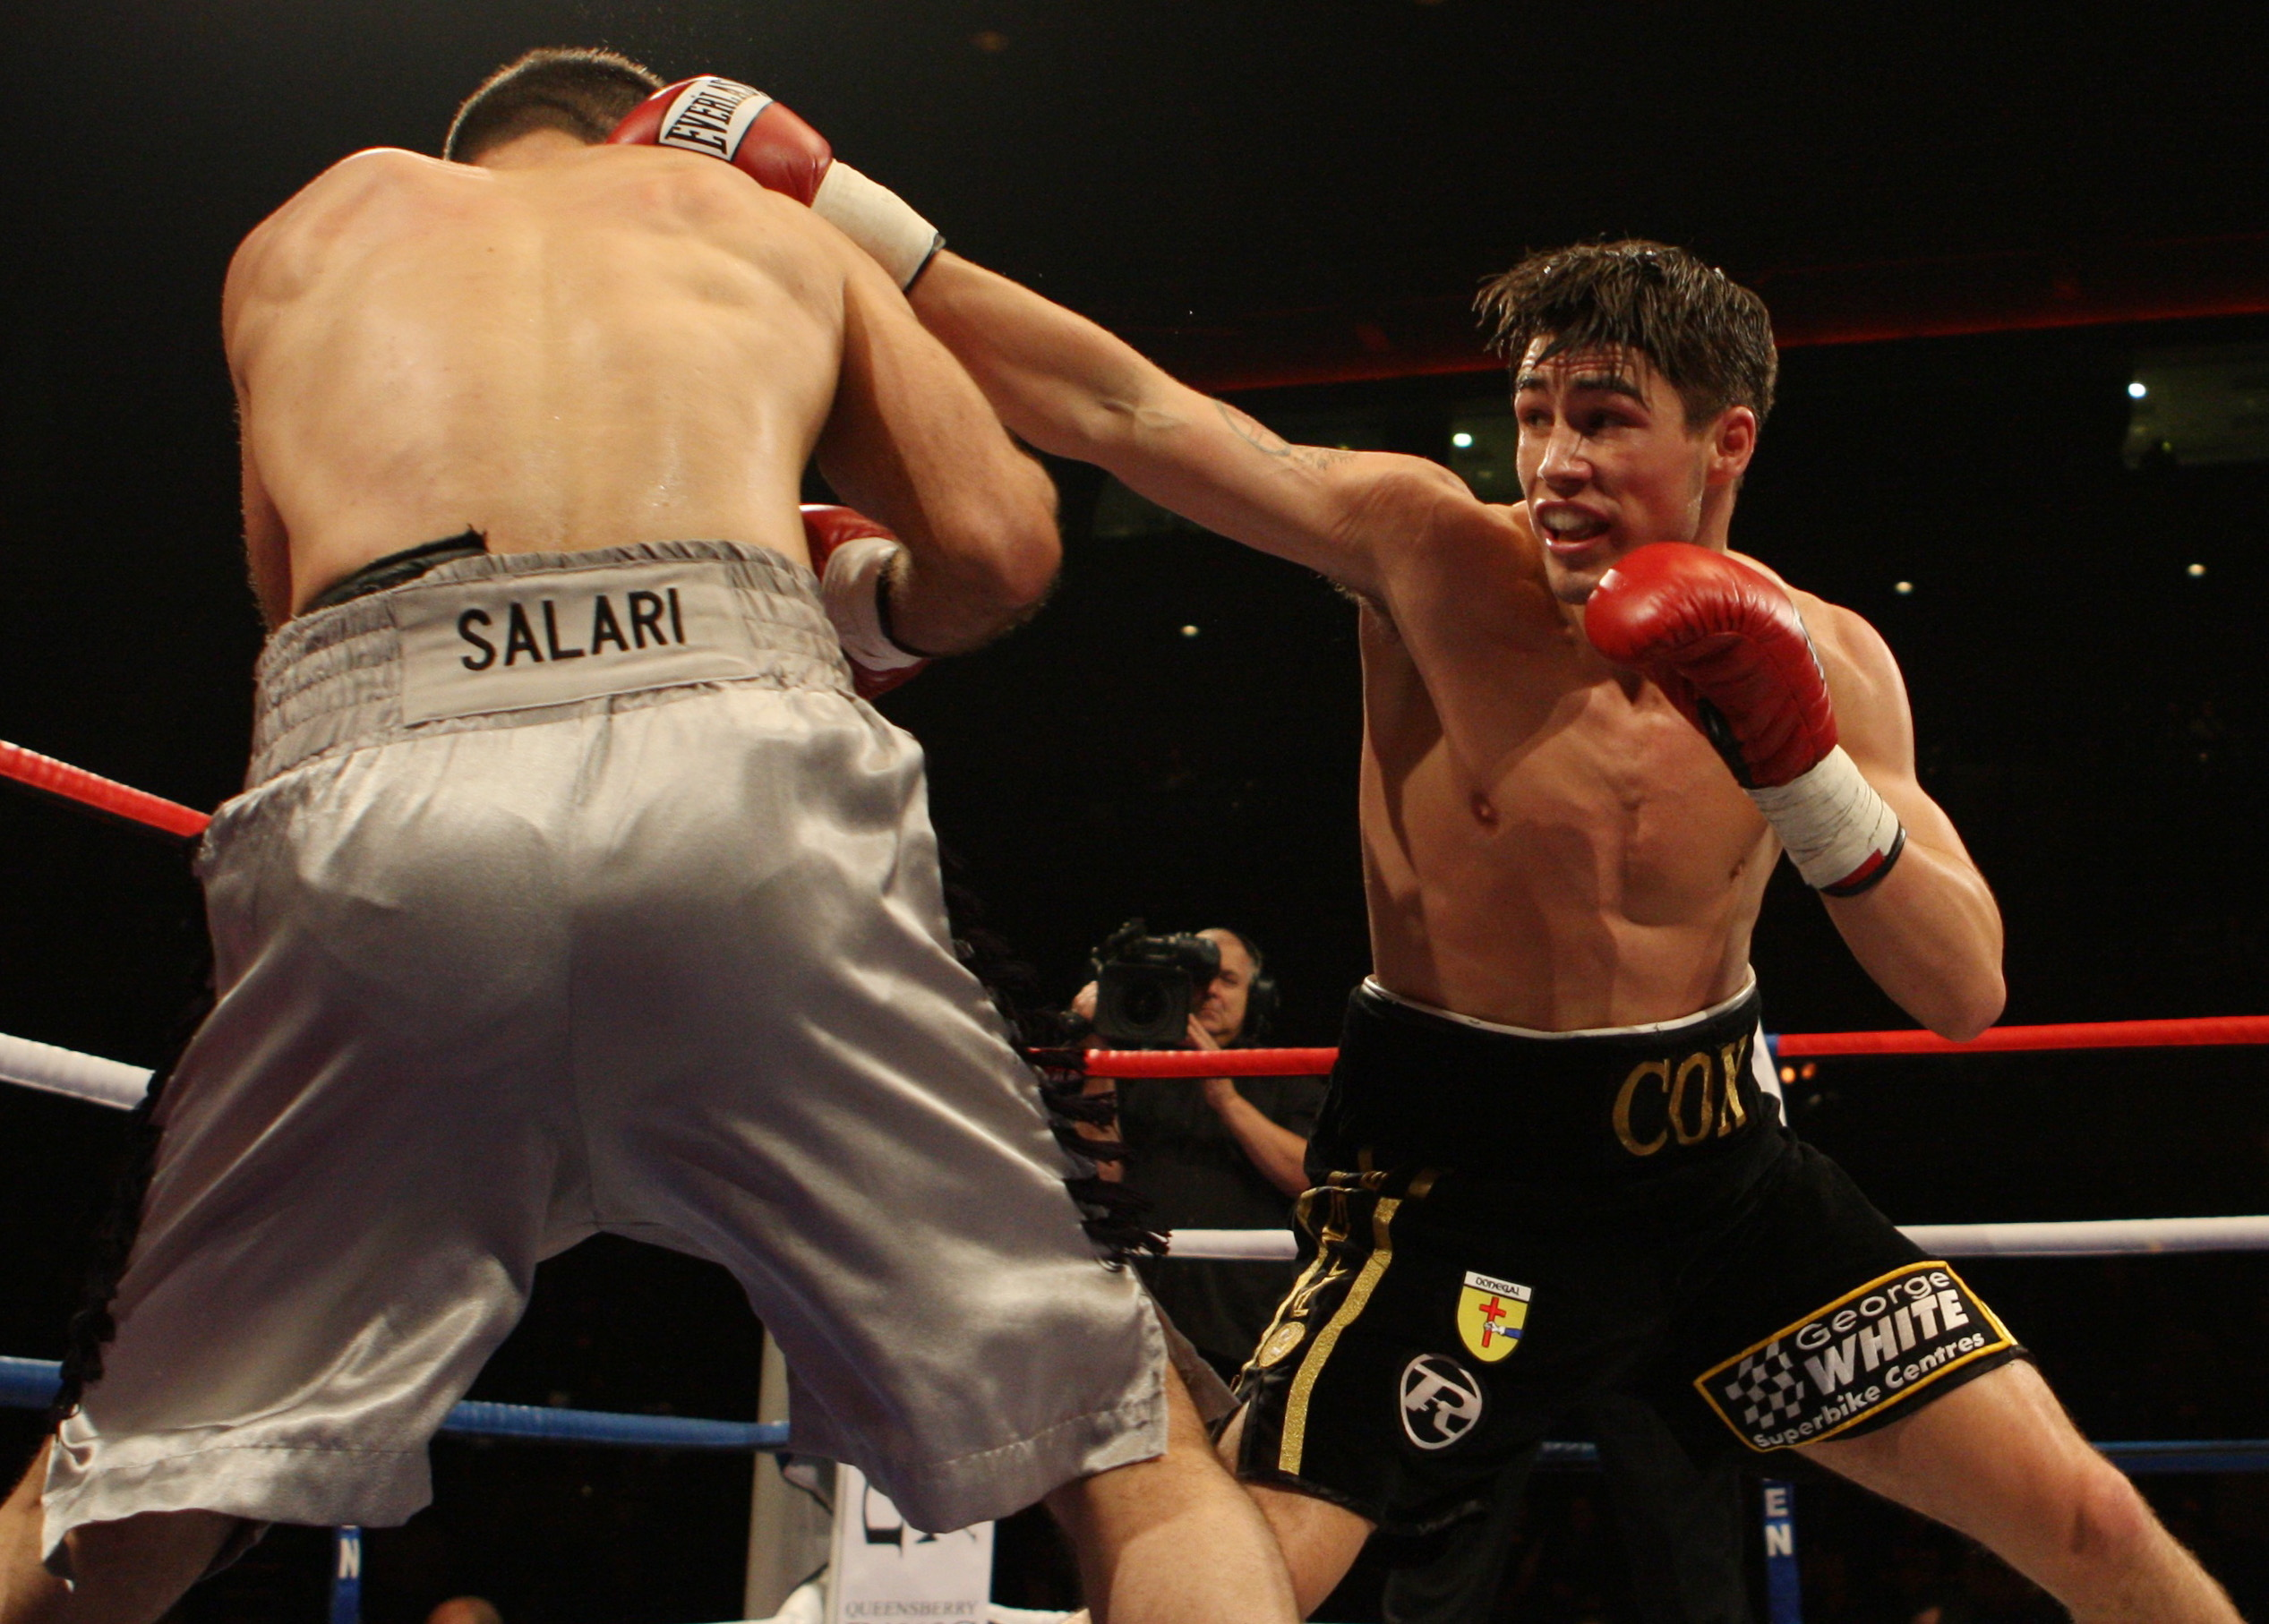 Boxing - Jamie Cox v Manoocha Salari - Welterweight Fight - Liverpool Echo Arena - 30/10/09 Jamie Cox (R) in action against Manoocha Salari  Mandatory Credit: Action Images / Carl Recine